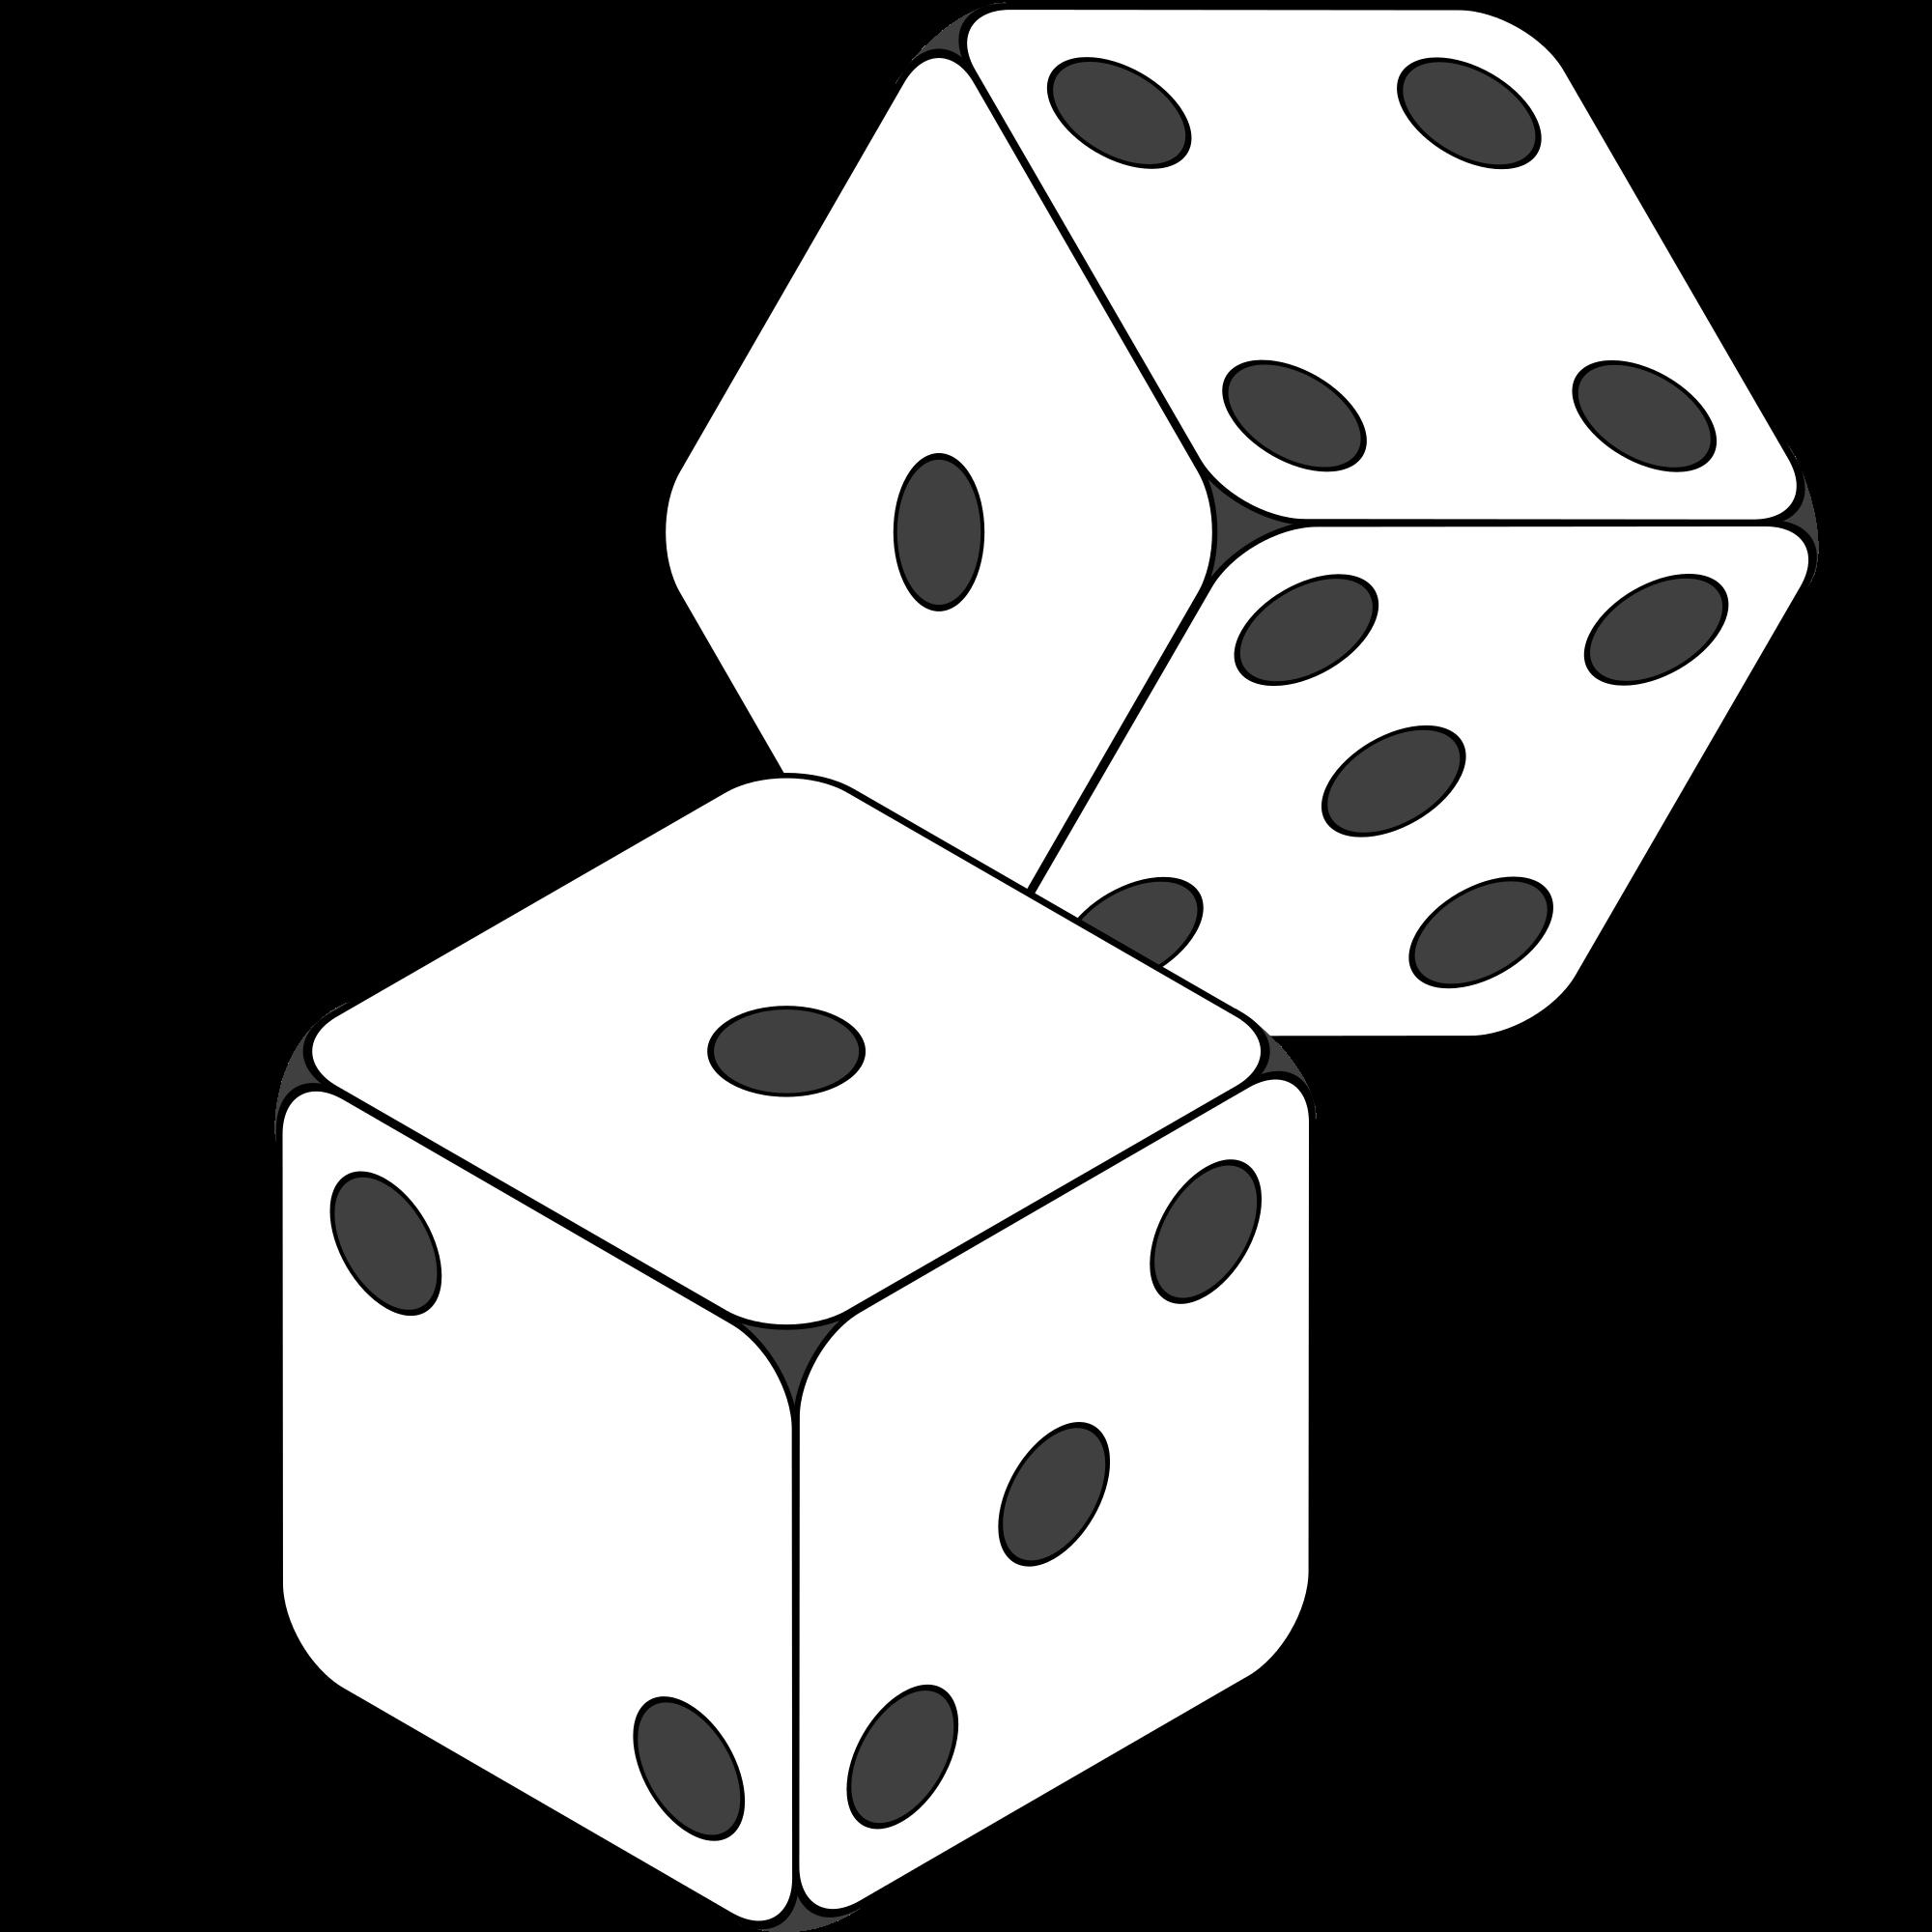 png transparent Games clipart probability